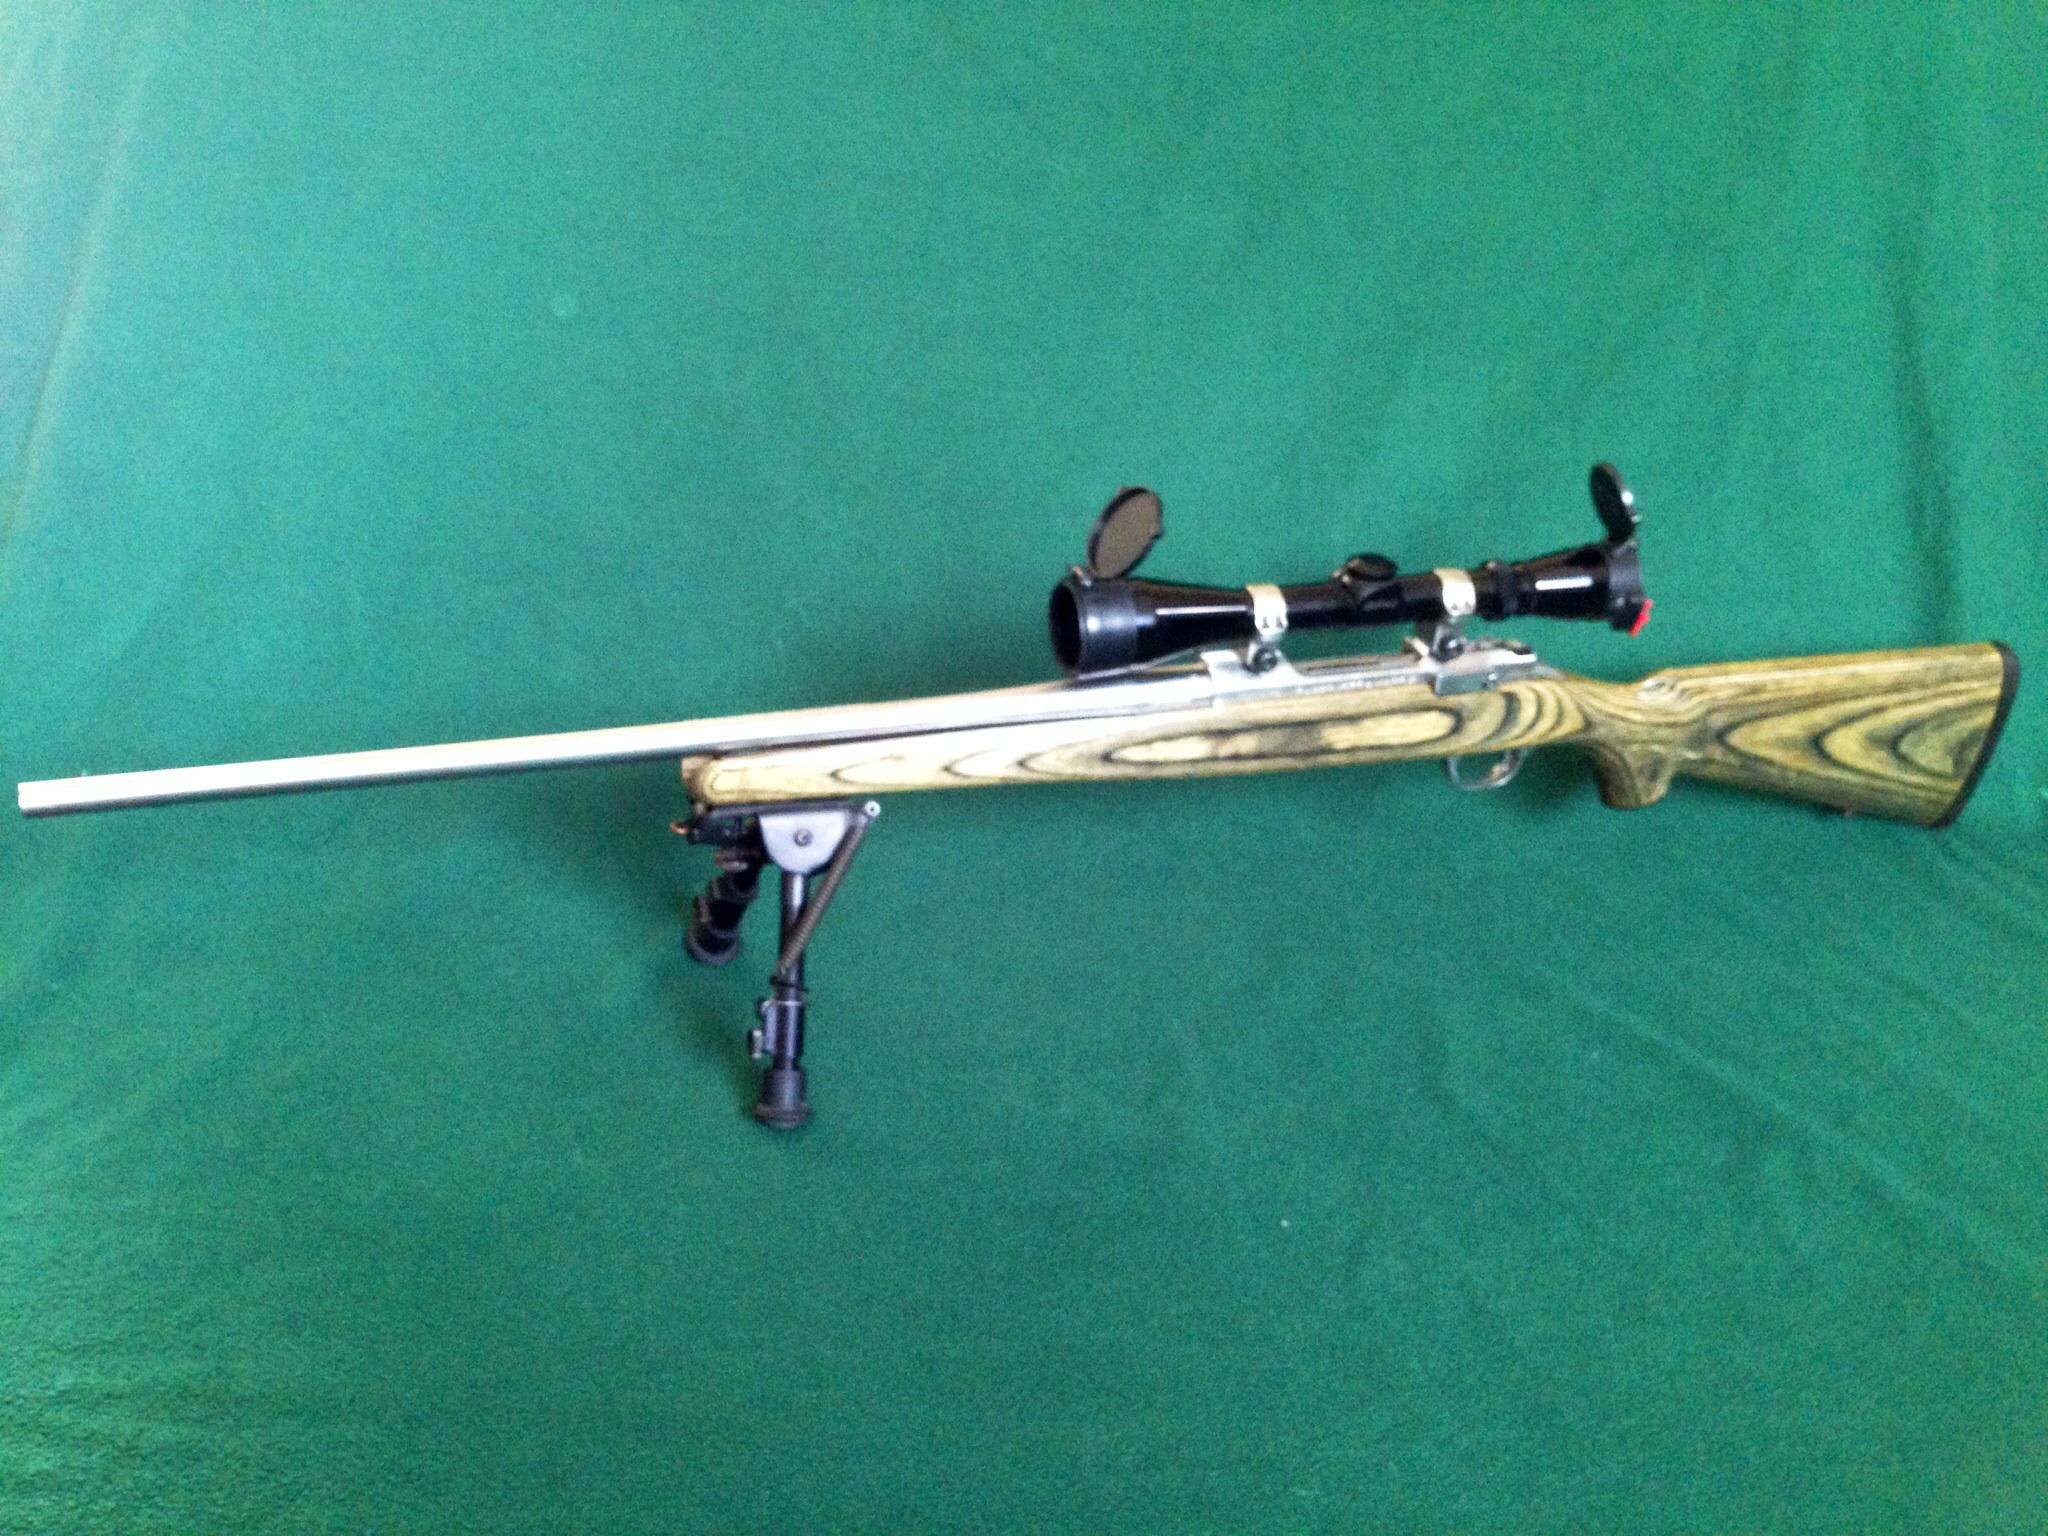 New rifle!!!-image.jpg